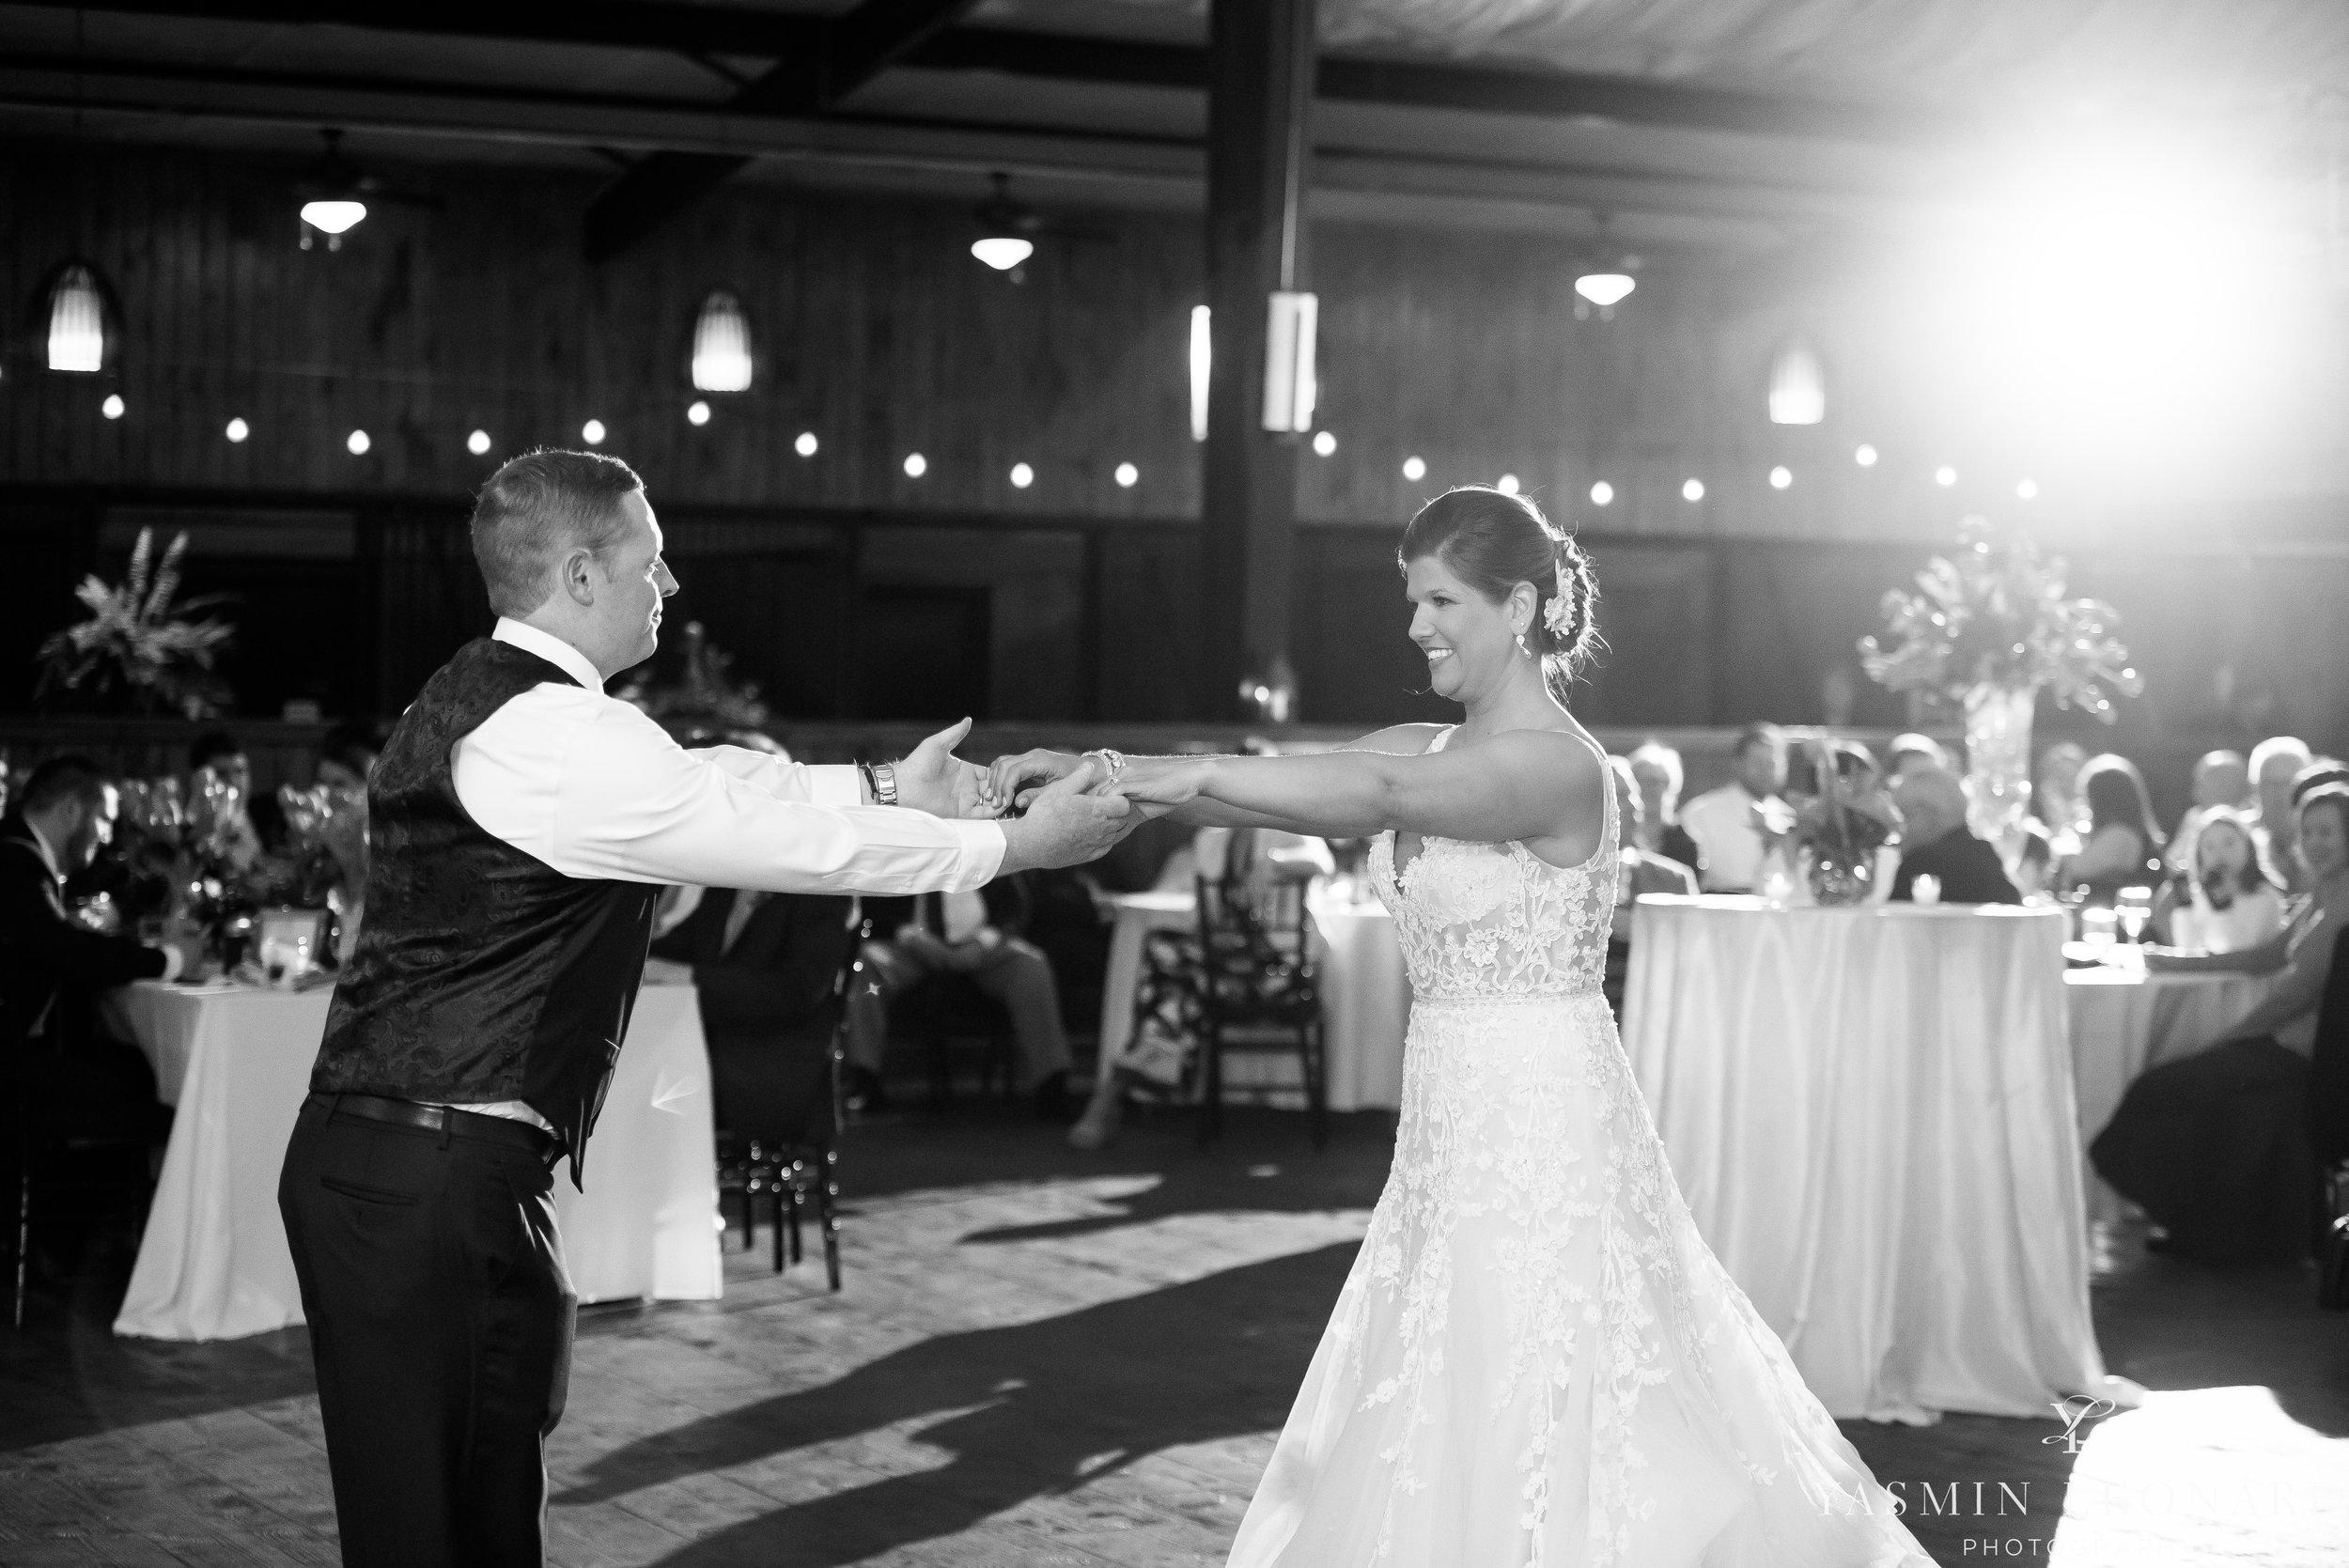 Adaumont Farm - Adaumont Farm Weddings - Trinity Weddings - NC Weddings - Yasmin Leonard Photography-63.jpg